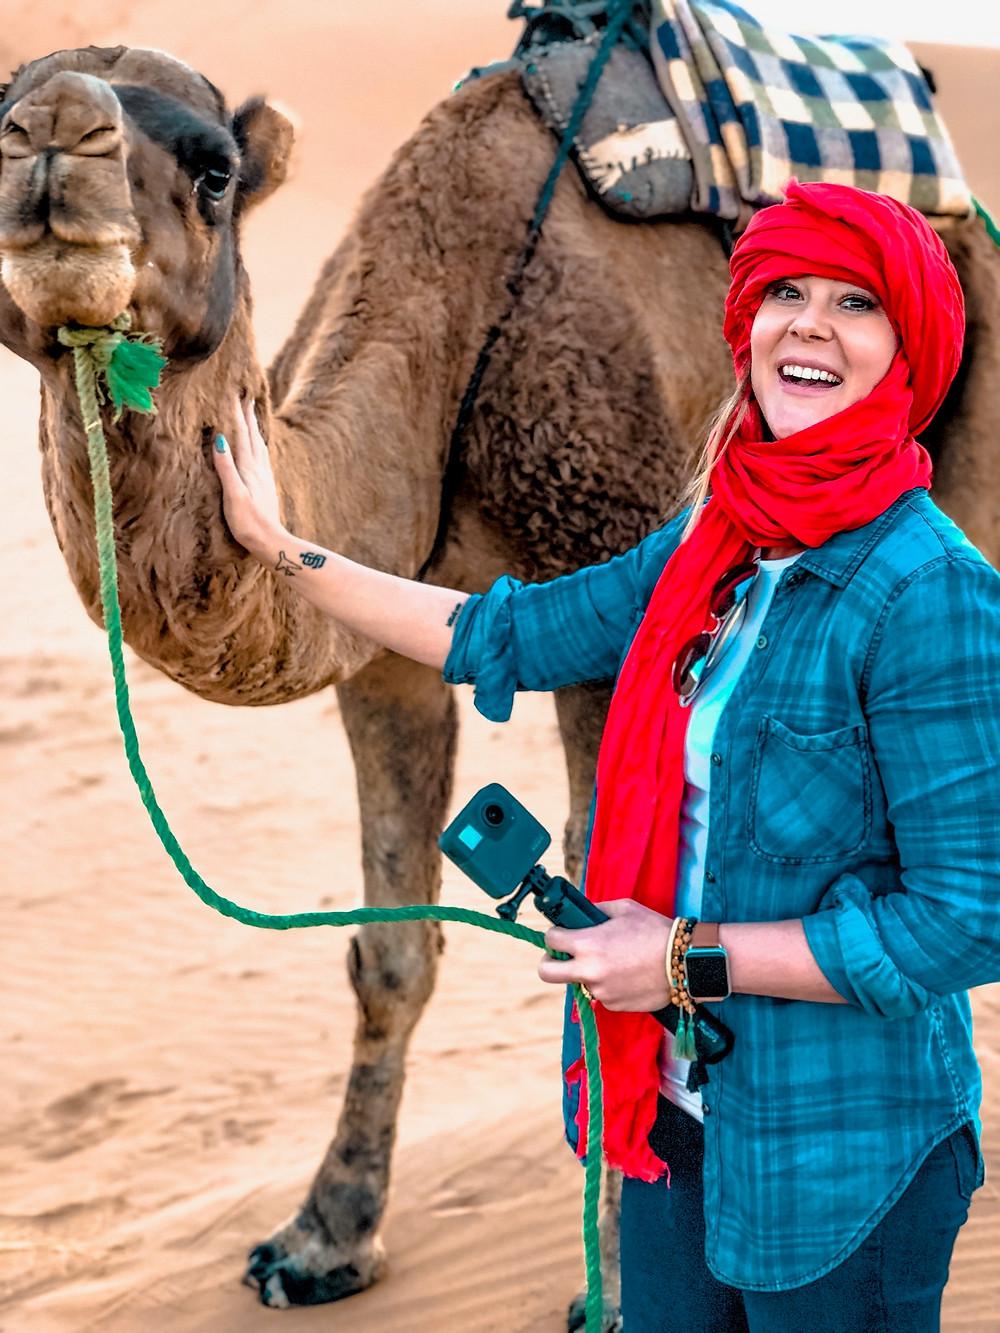 Riding Dromedaries in the Desert